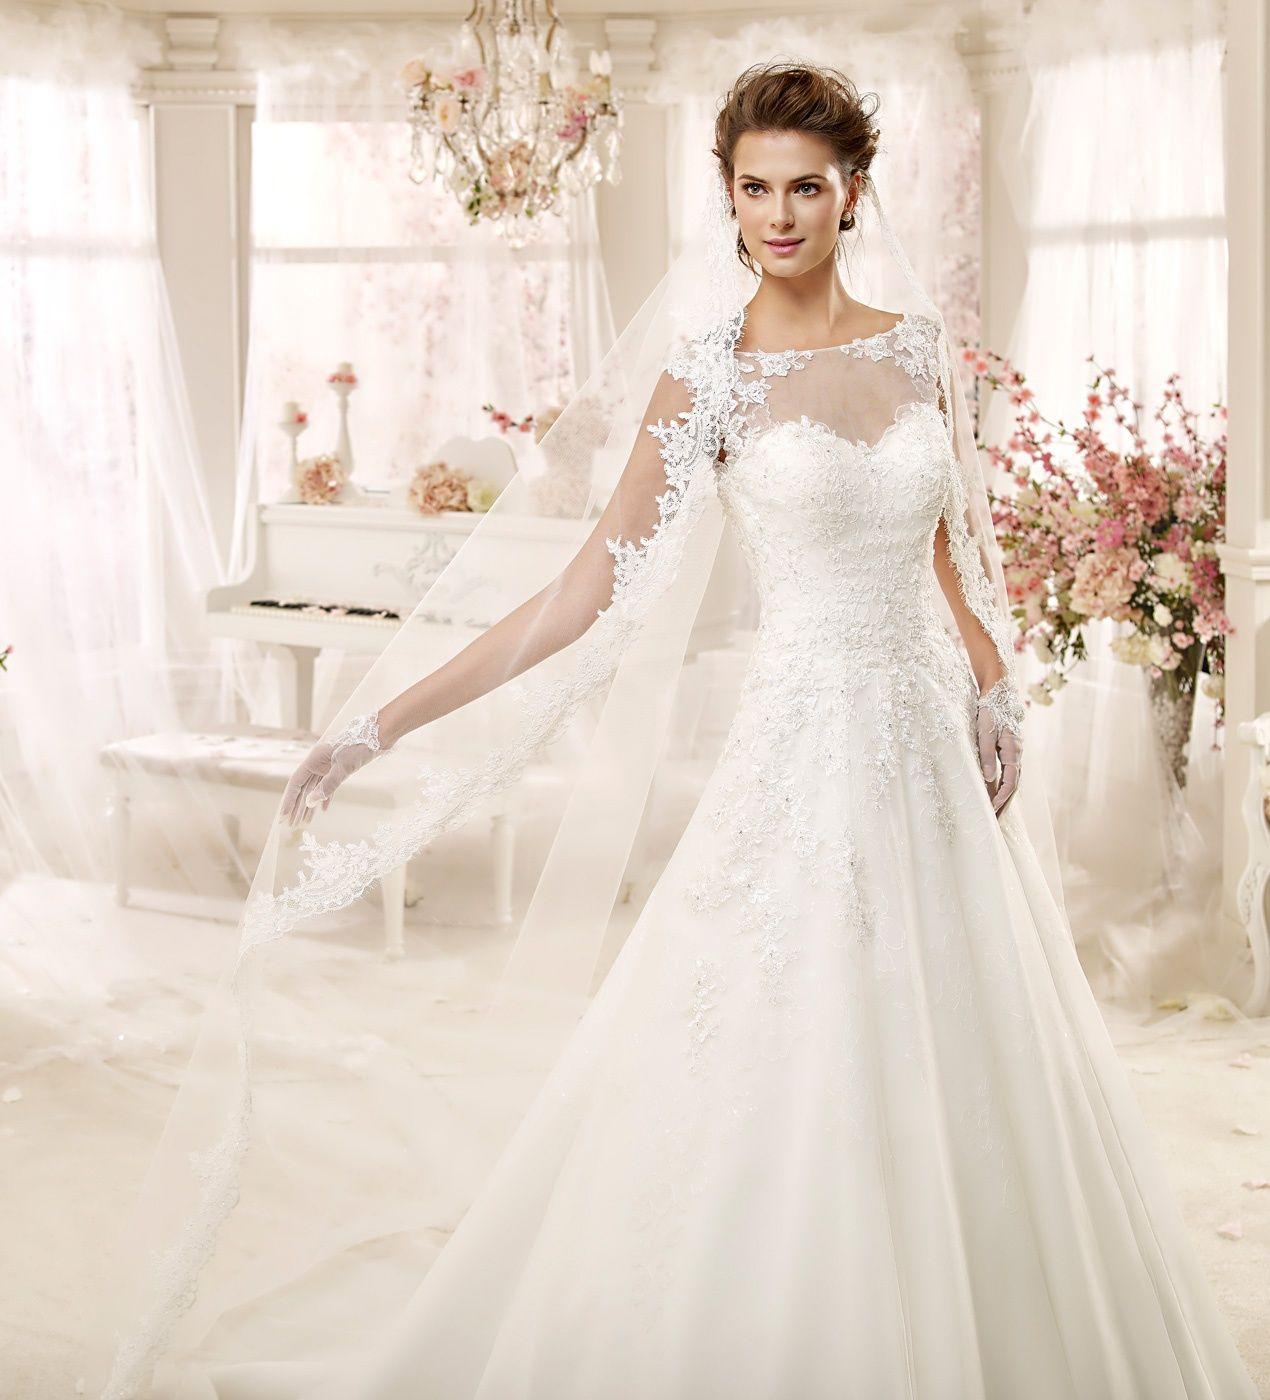 Wedding Dress Colet COAB16221 2016